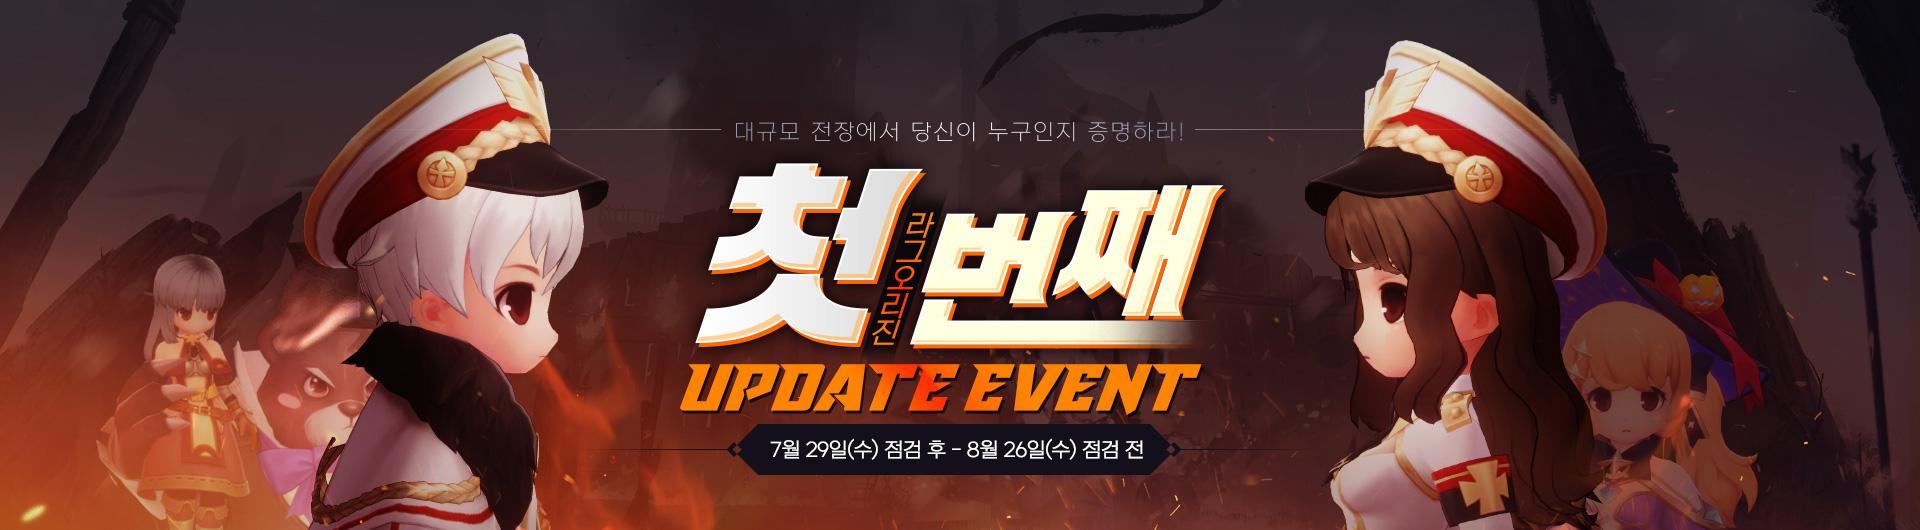 event1